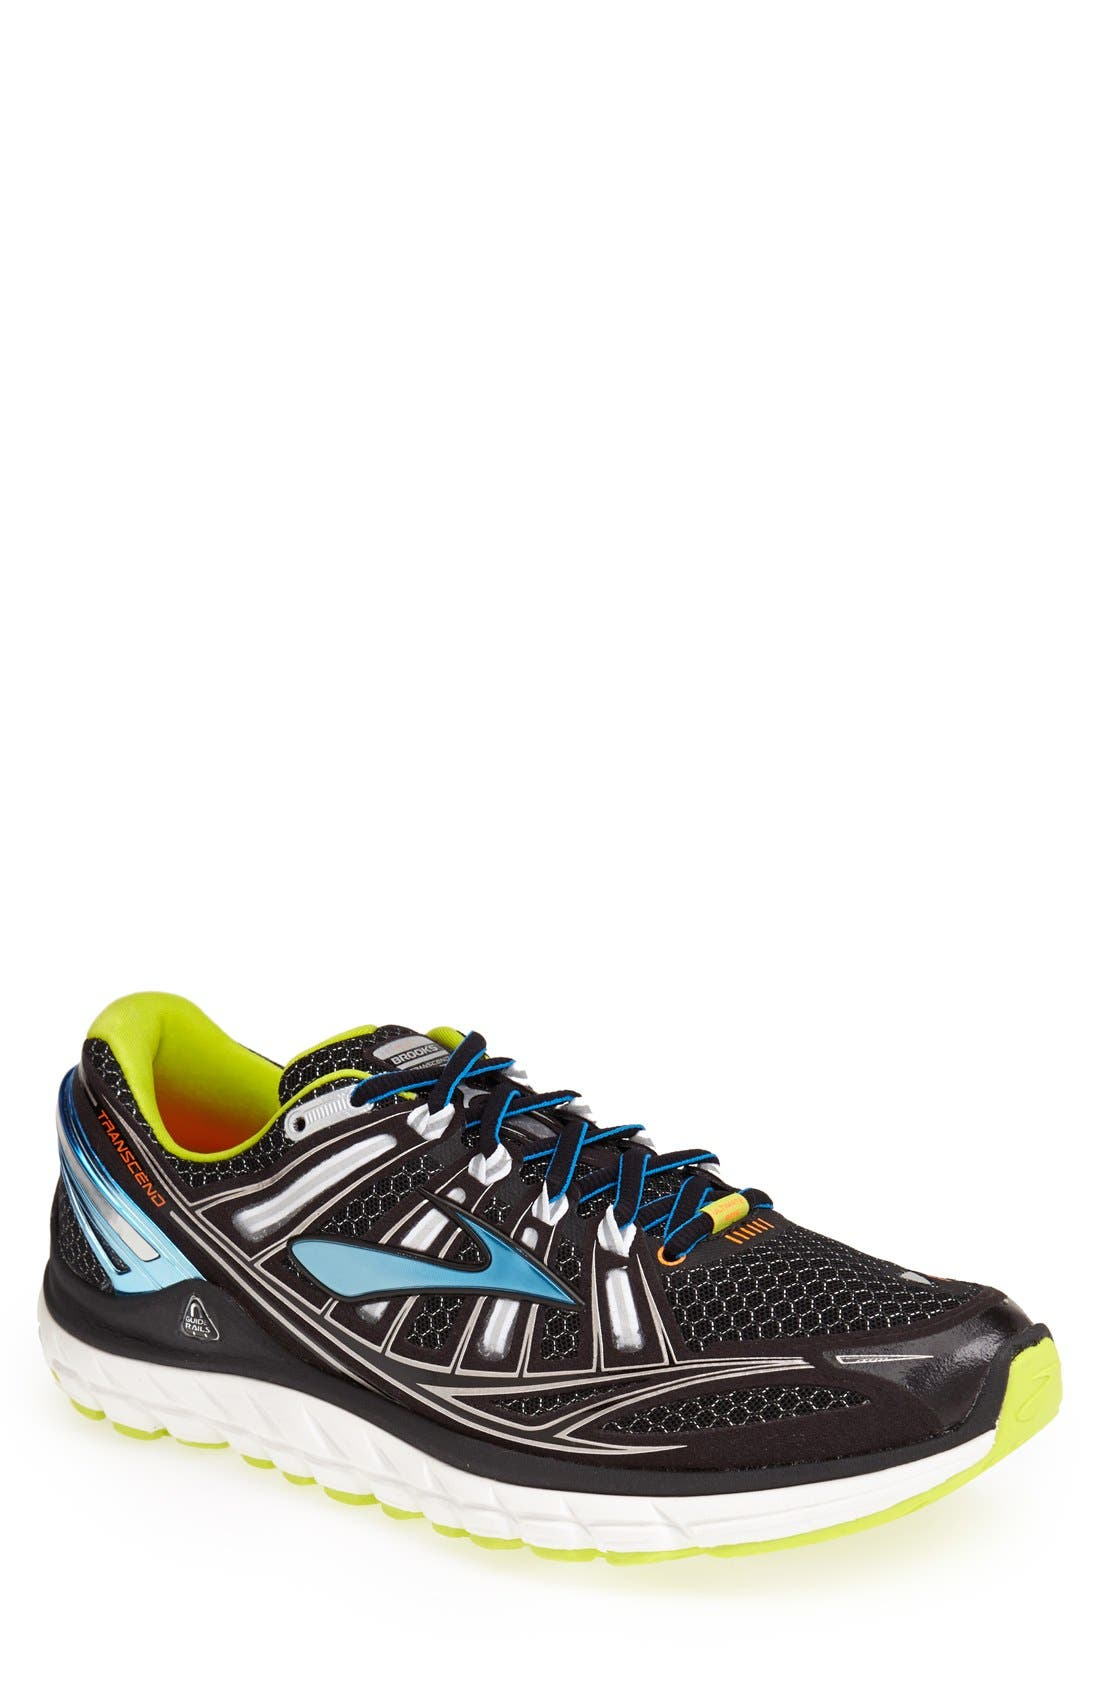 Alternate Image 1 Selected - Brooks 'Transcend' Running Shoe (Men)